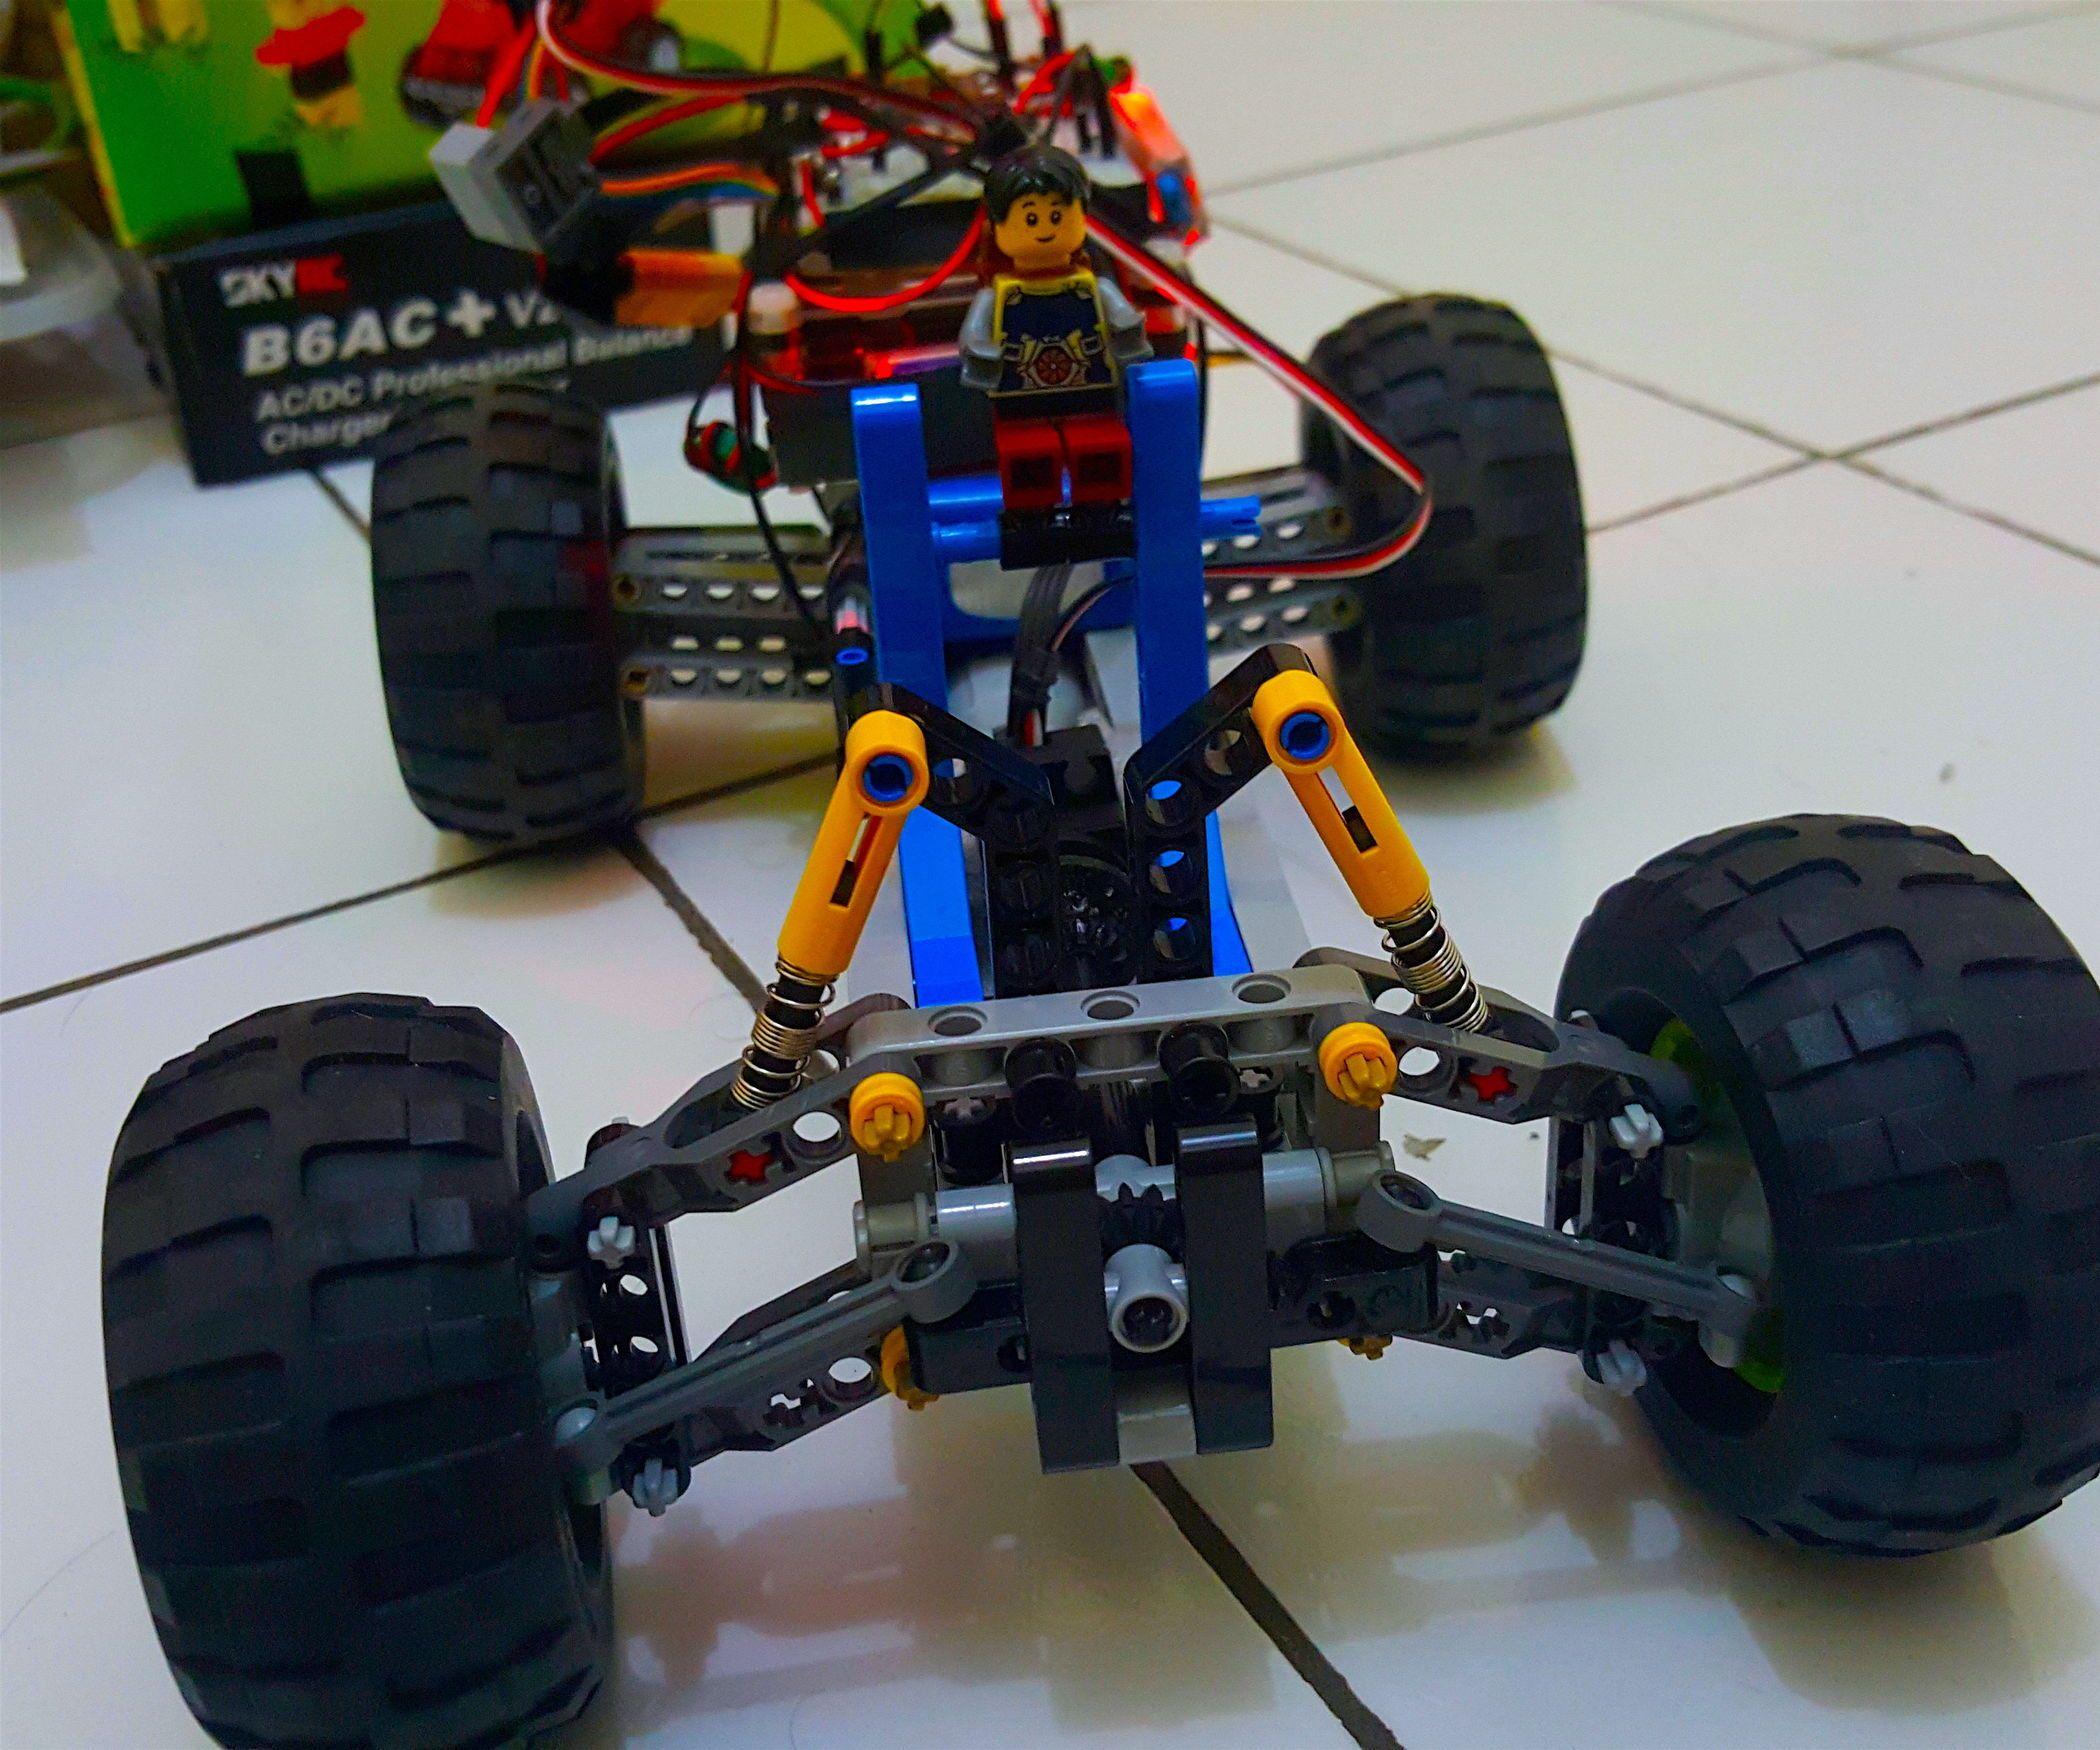 DIY Control Offroad Lego Car Through (IoT